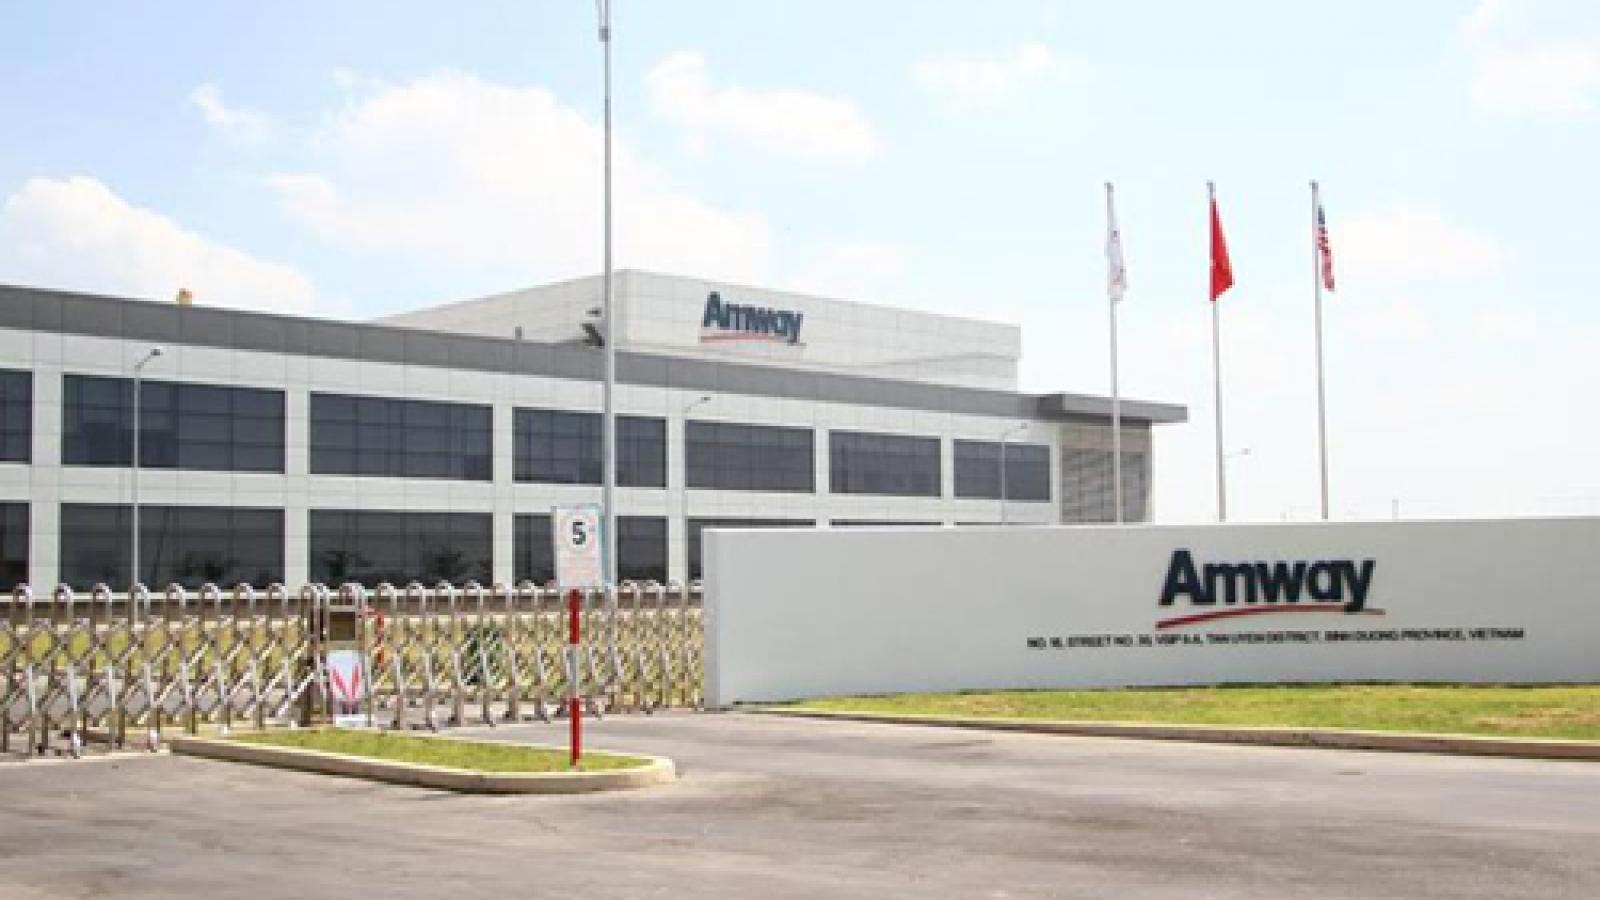 Amway found violating multiple regulations on multi-level marketing